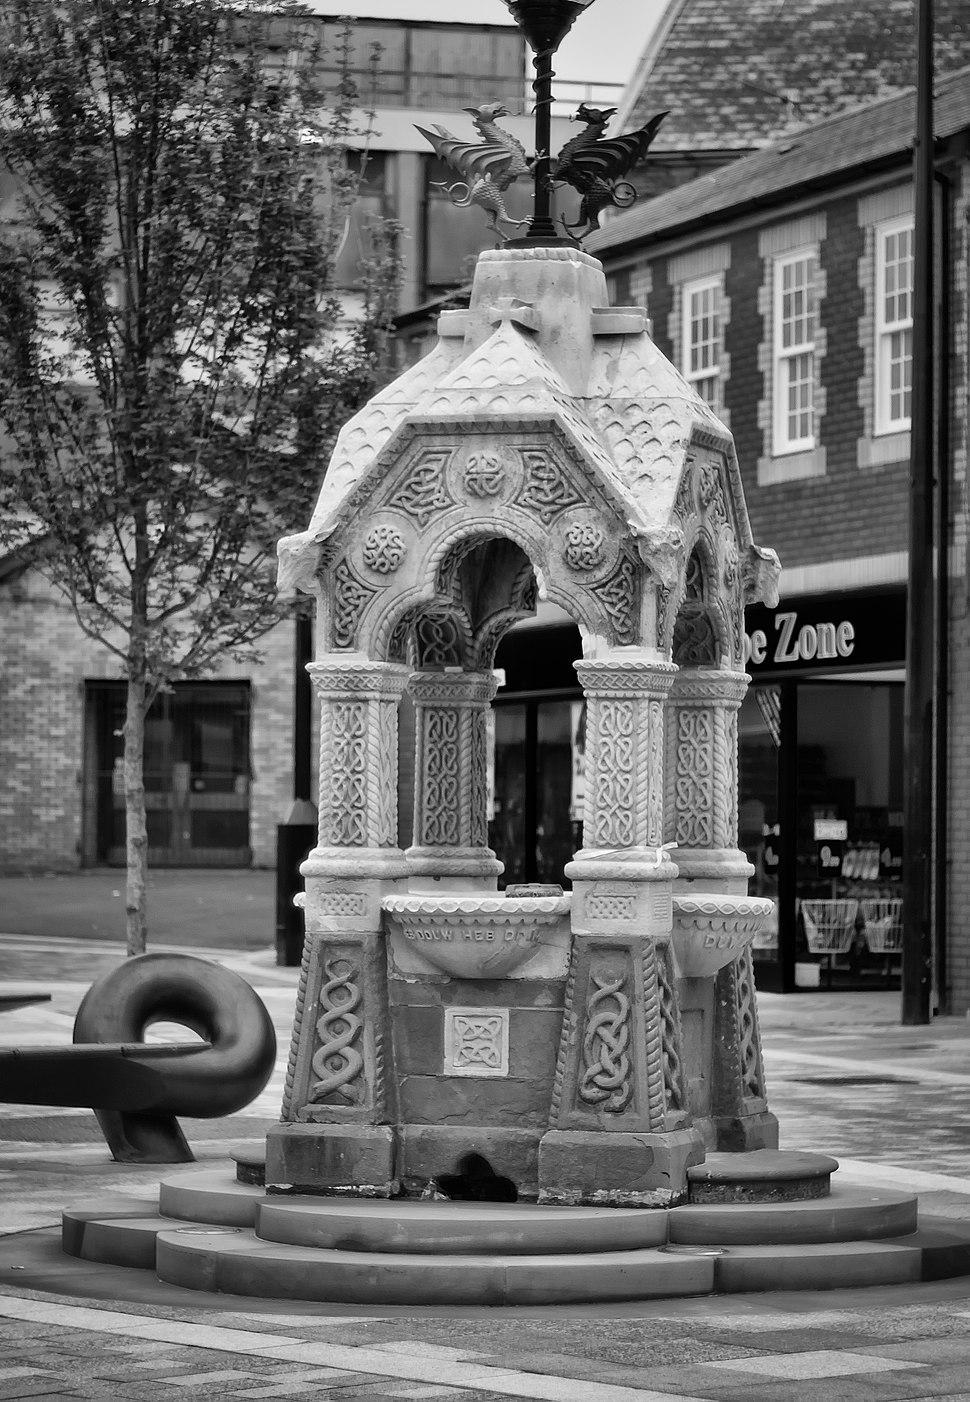 Fountain, Taff St, Pontypridd